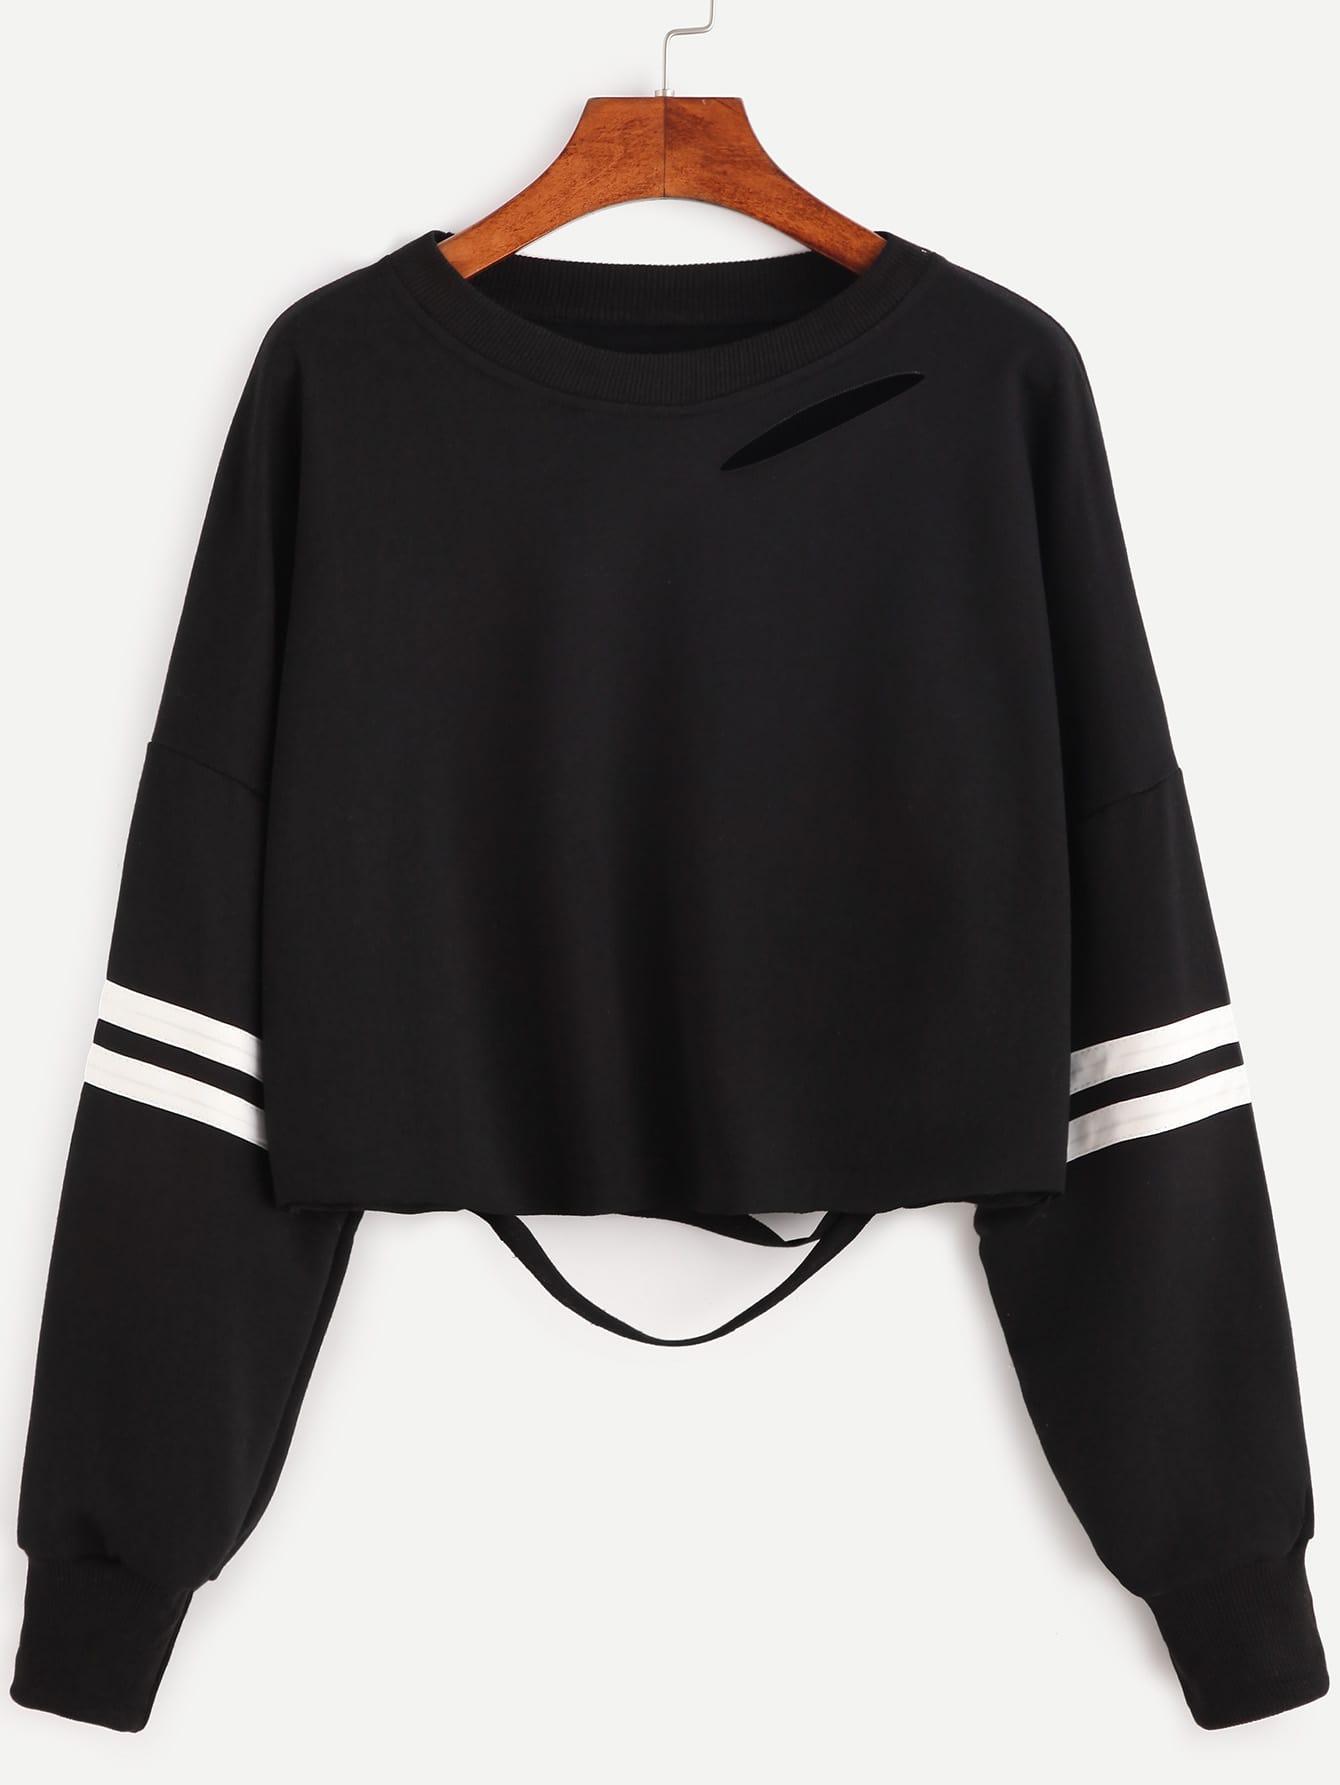 Black Varsity Striped Ripped Crop Sweatshirt sweatshirt160926102